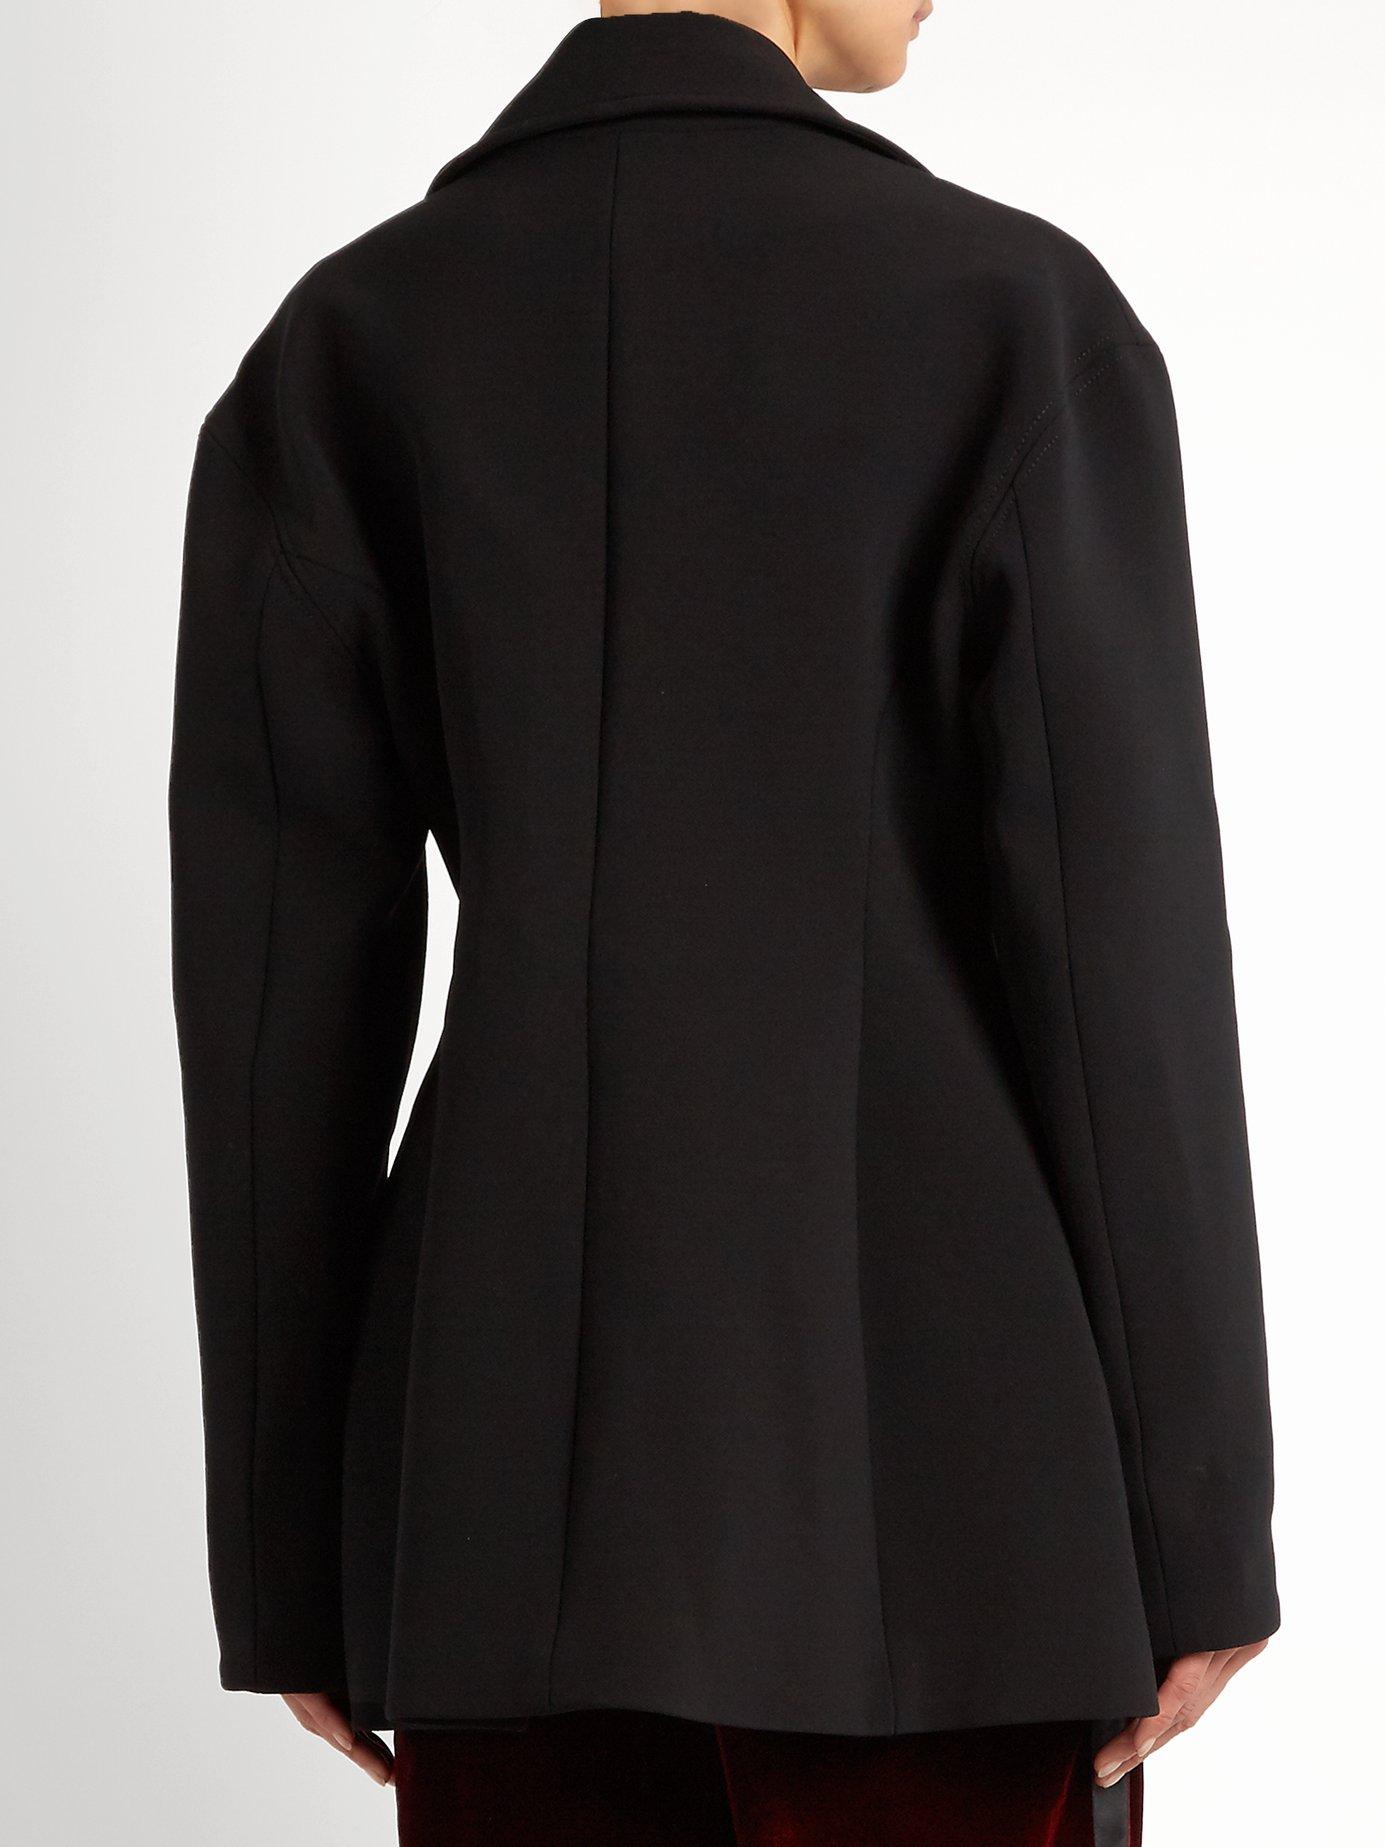 Marilyn twill jacket by Ellery